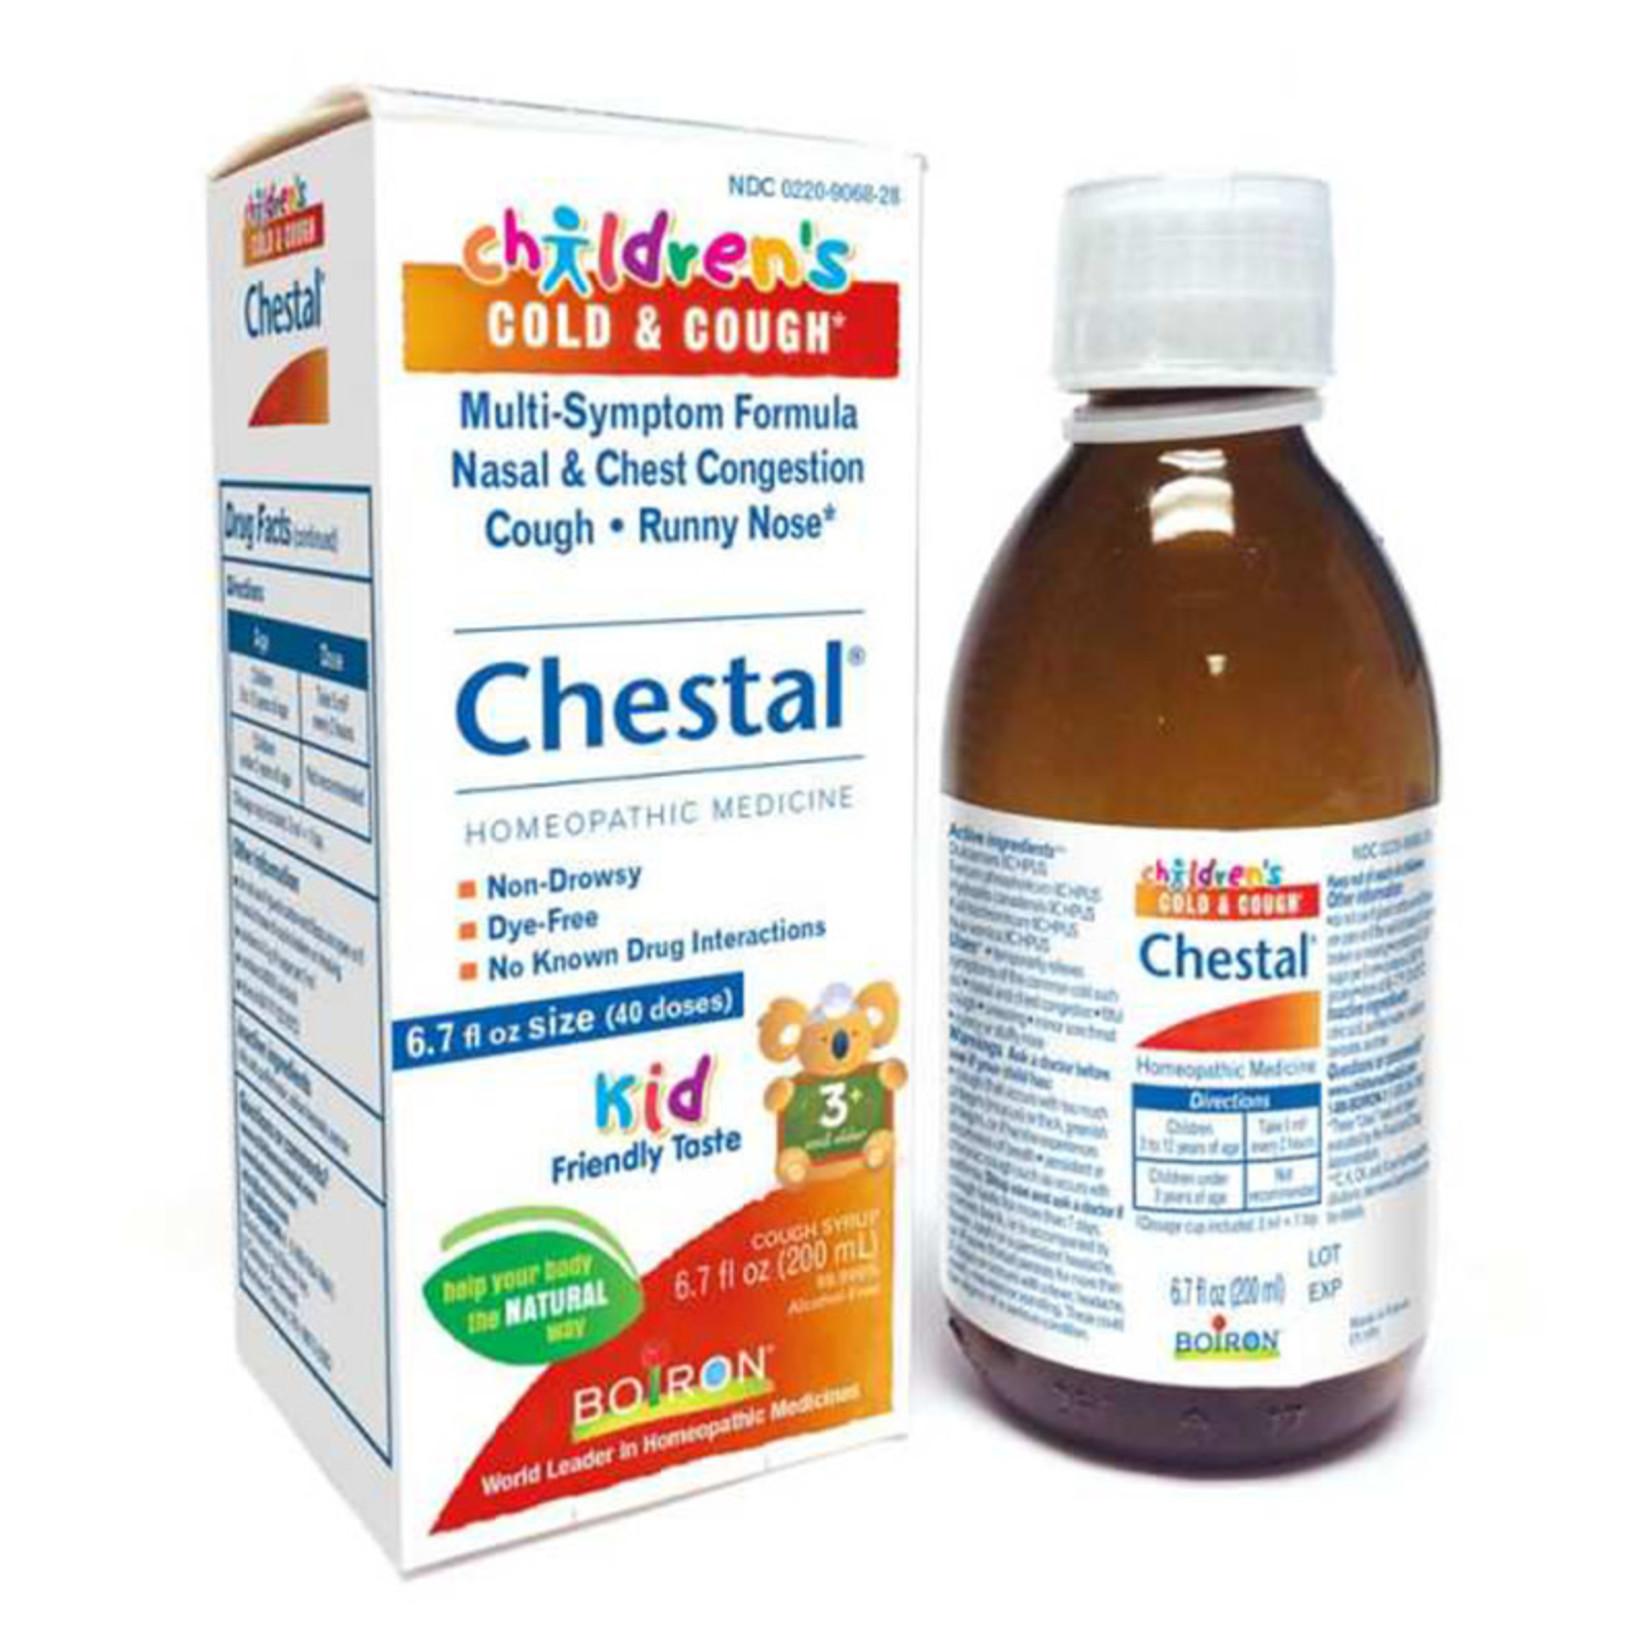 Children's Chestal - Cold & Cough